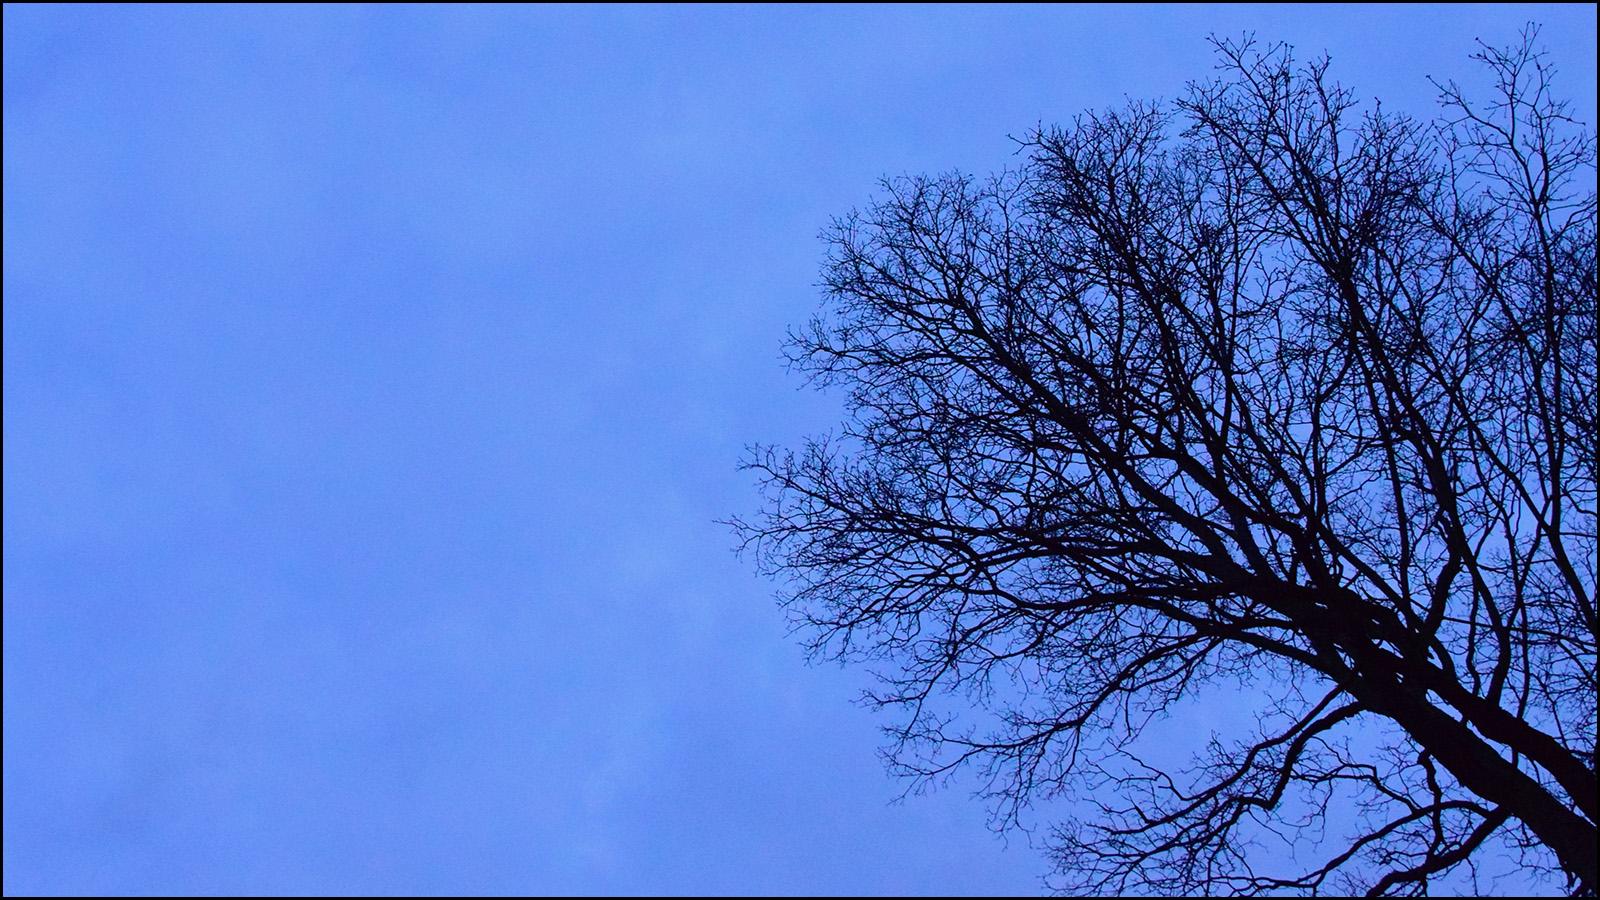 tree at dusk (c) mark somple 2019